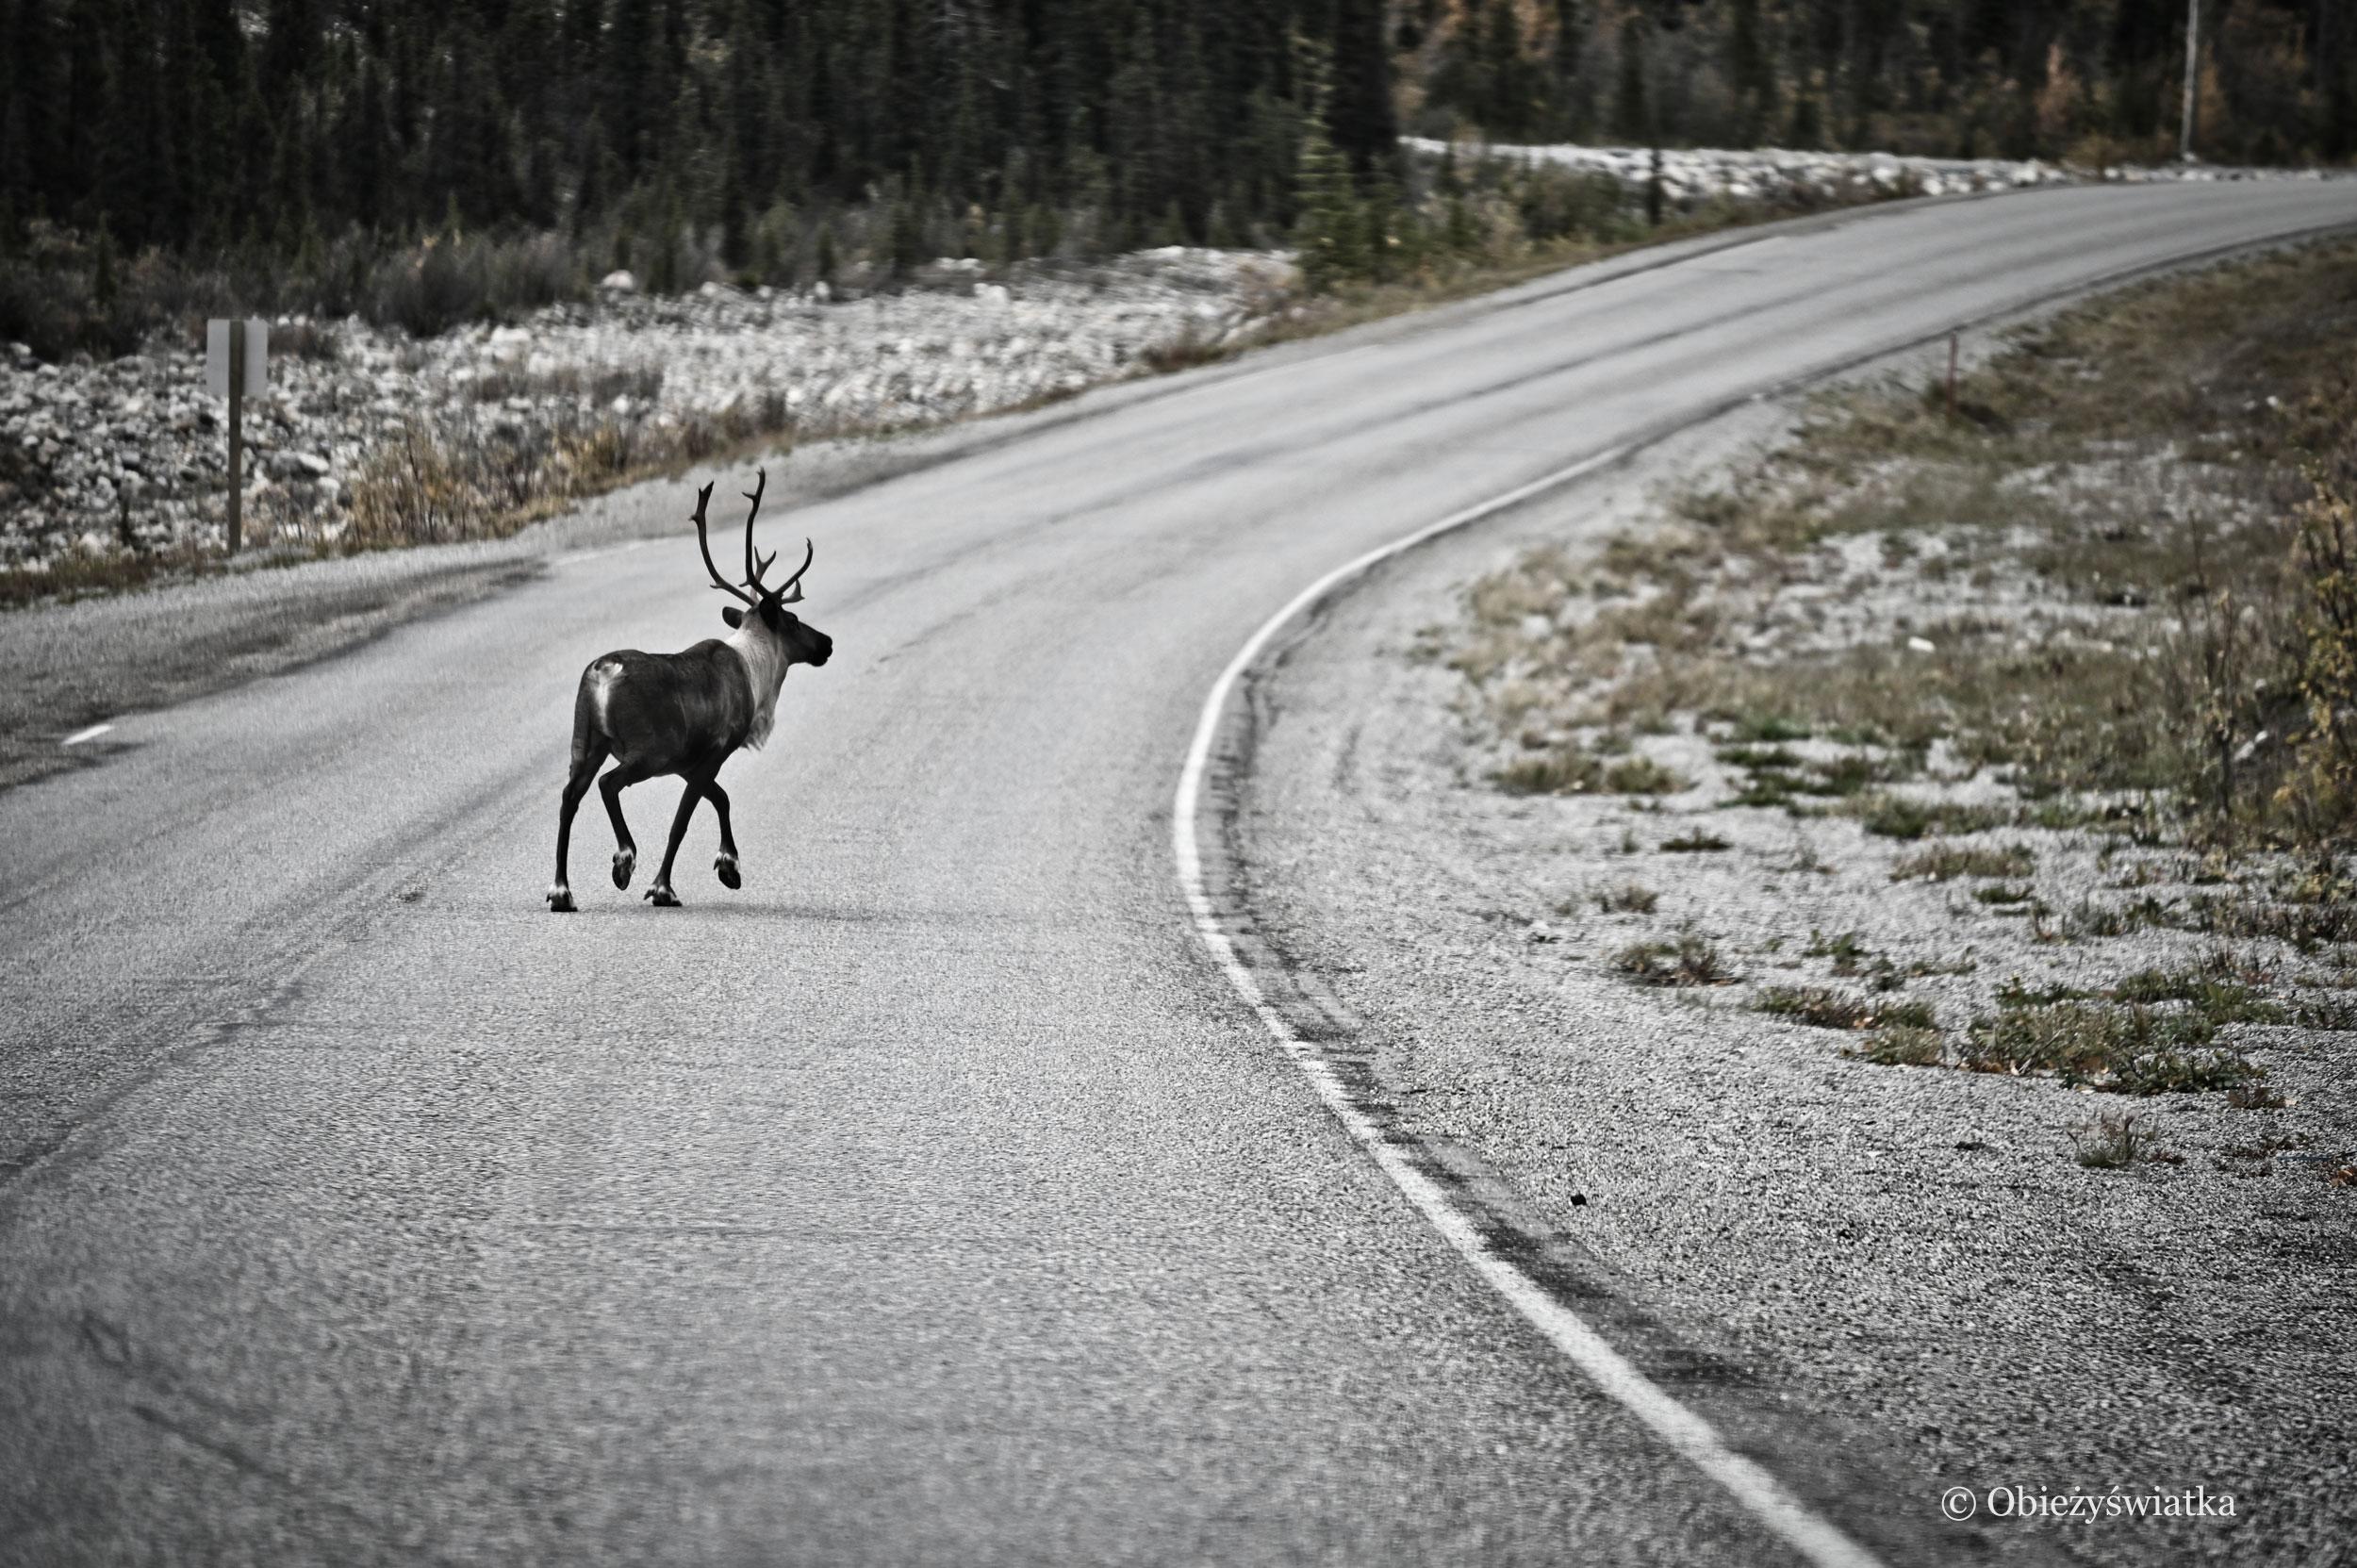 Karibu / renifer na drodze - Alaska Highway, Kanada